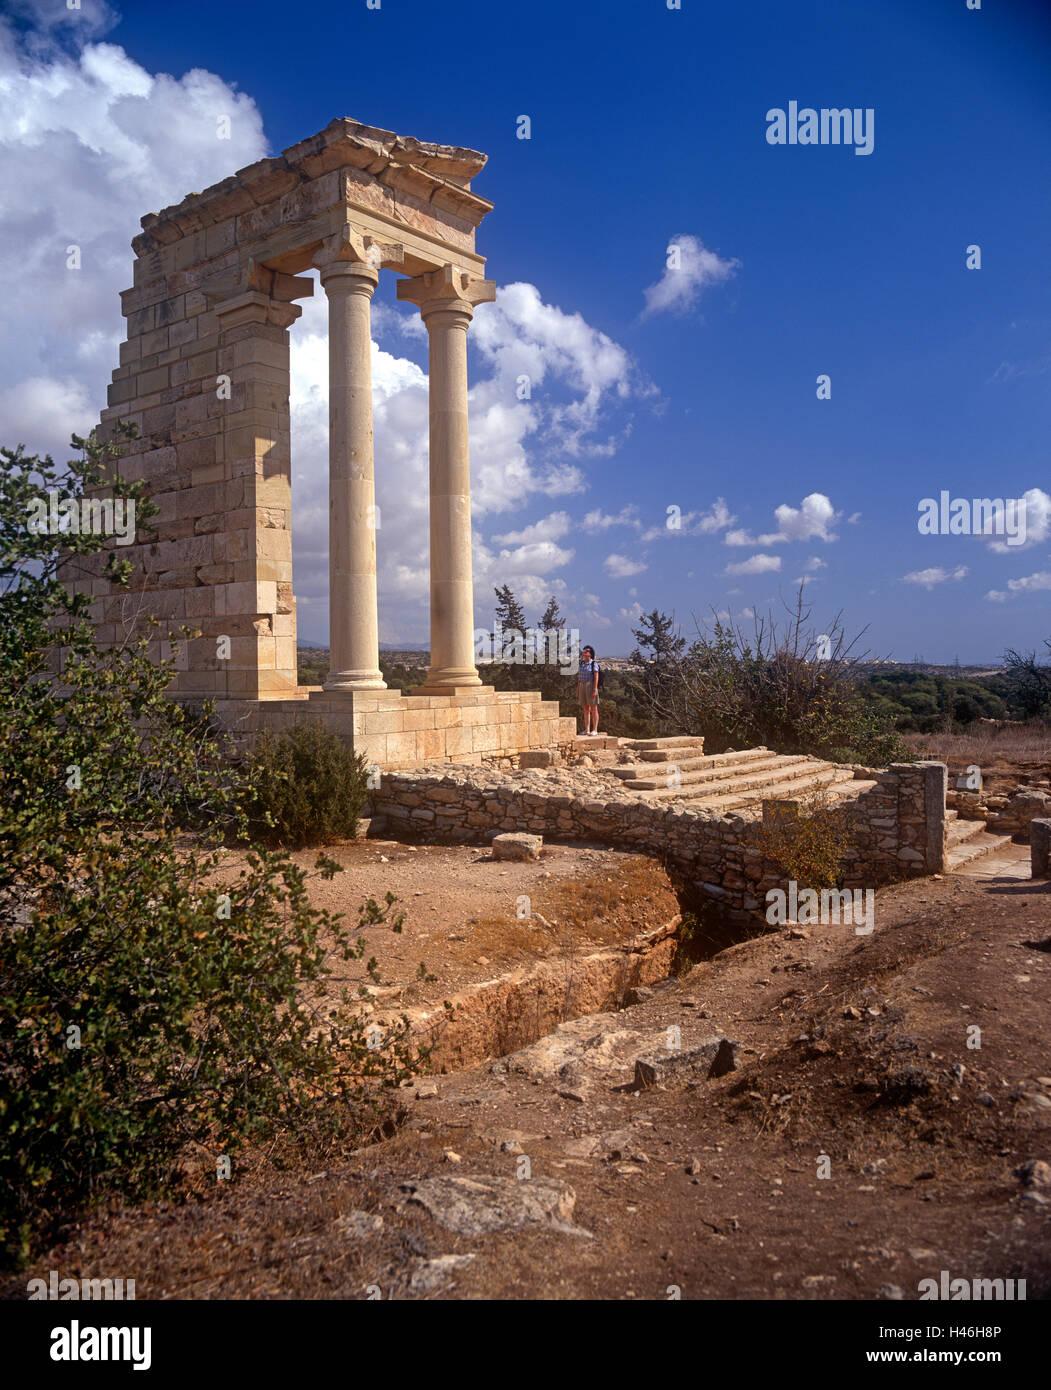 Ruines du temple Apollon Limassol Chypre Photo Stock